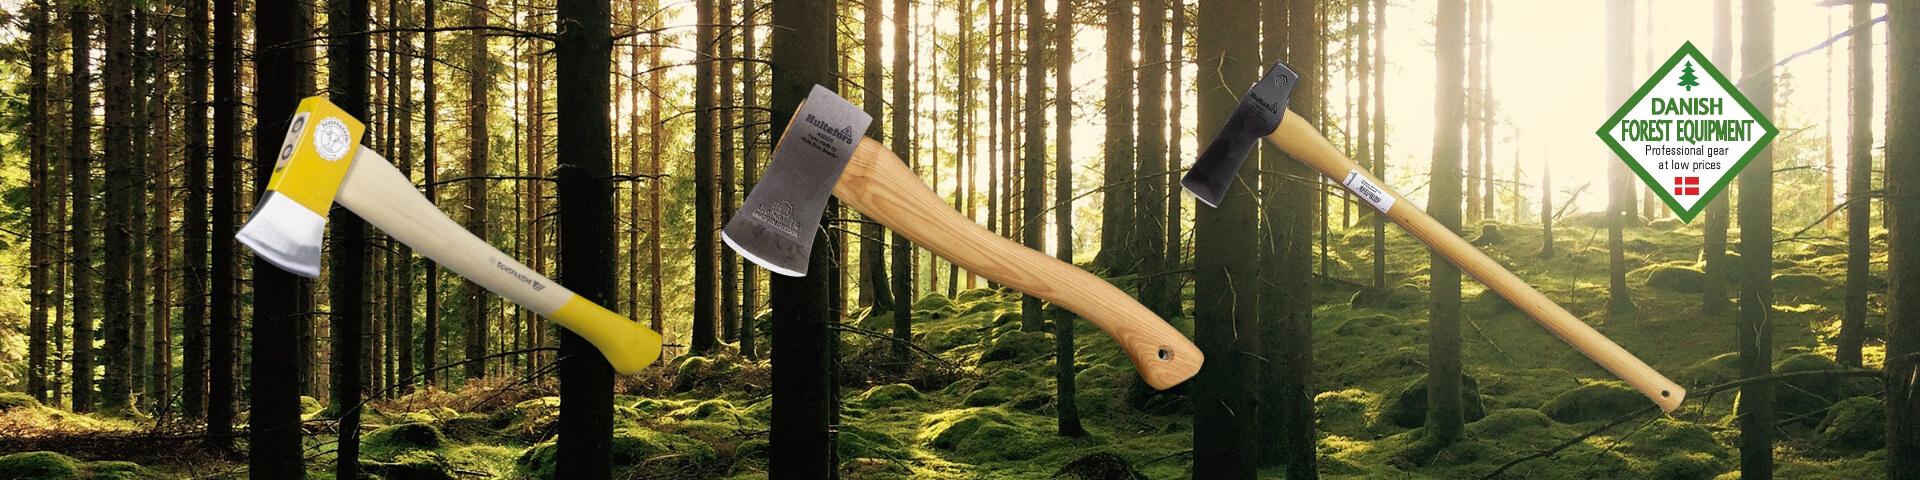 Danish Forest Equipment